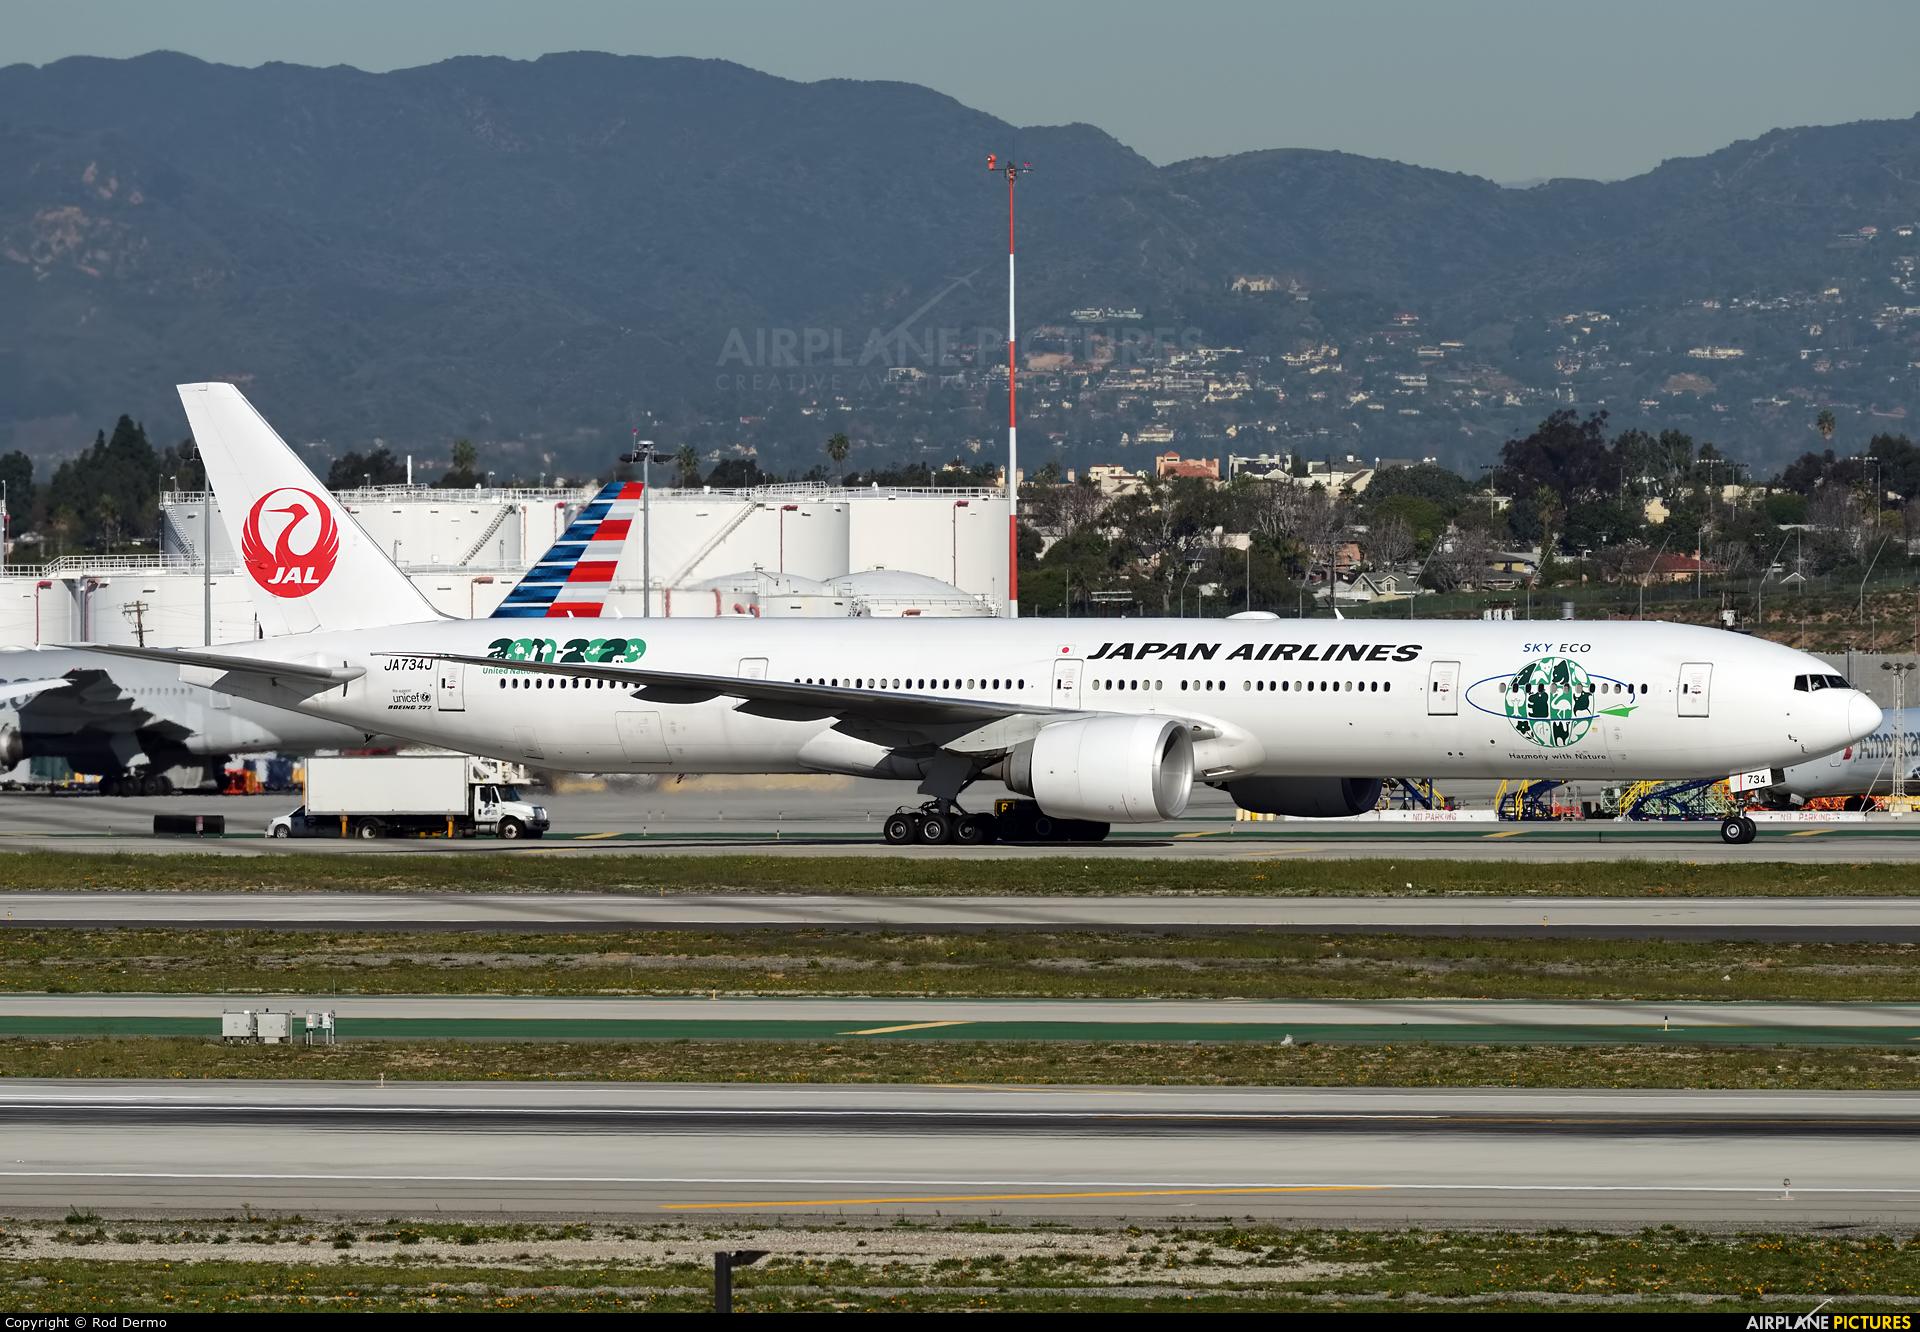 JAL - Japan Airlines JA734J aircraft at Los Angeles Intl